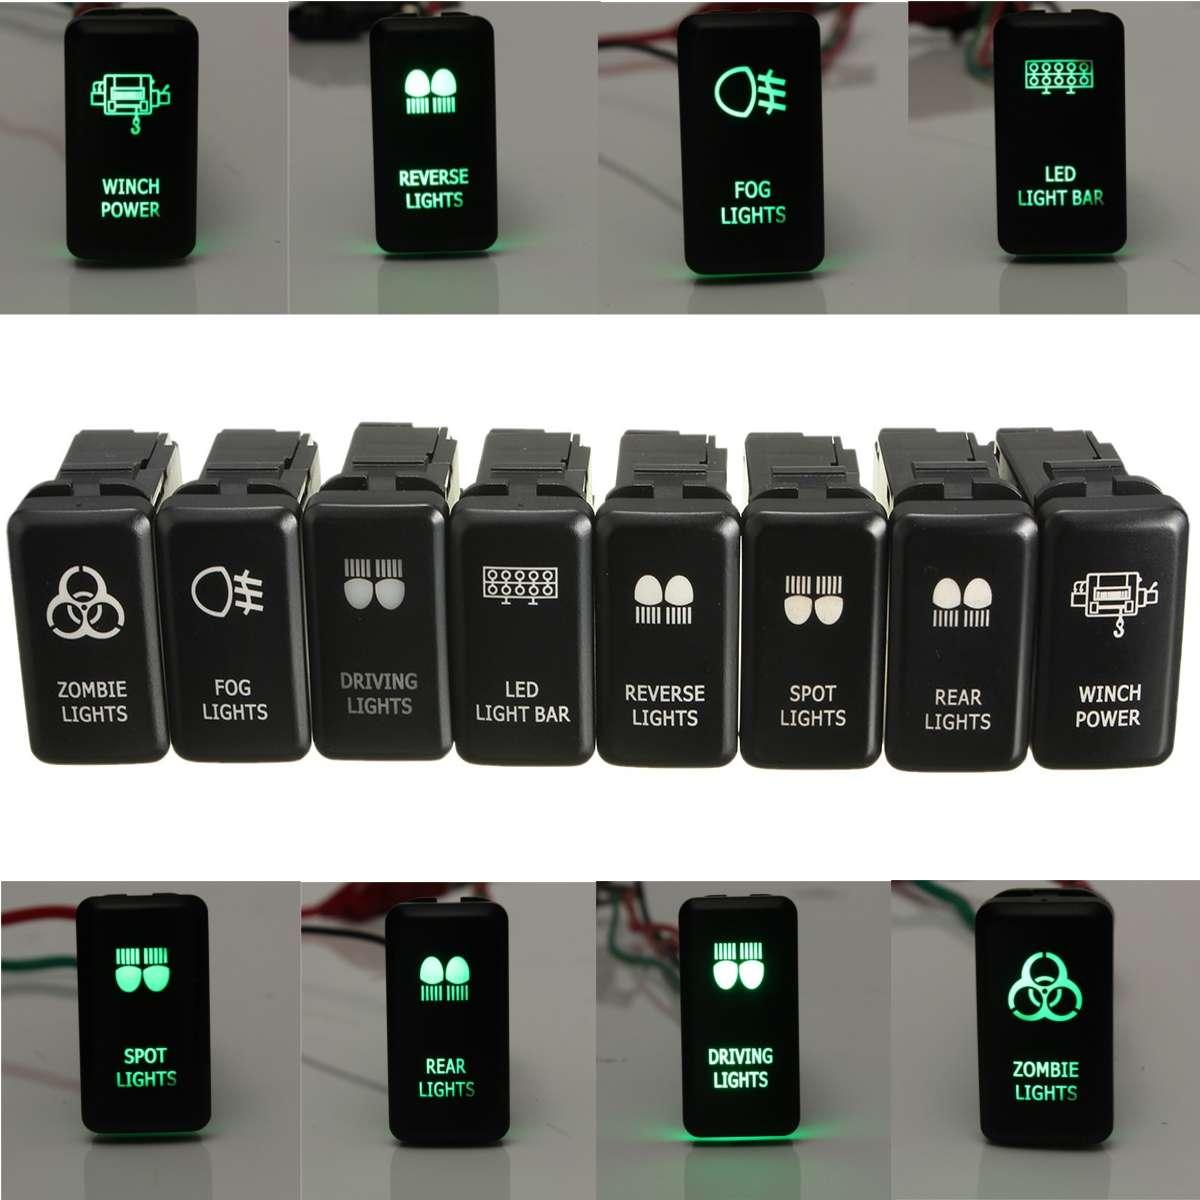 12V Green LED OEM Replacement Push Switch For Toyota Landcruiser Hilux Prado 120 SERIES 2003-2009 Led Light Bar Driving Light